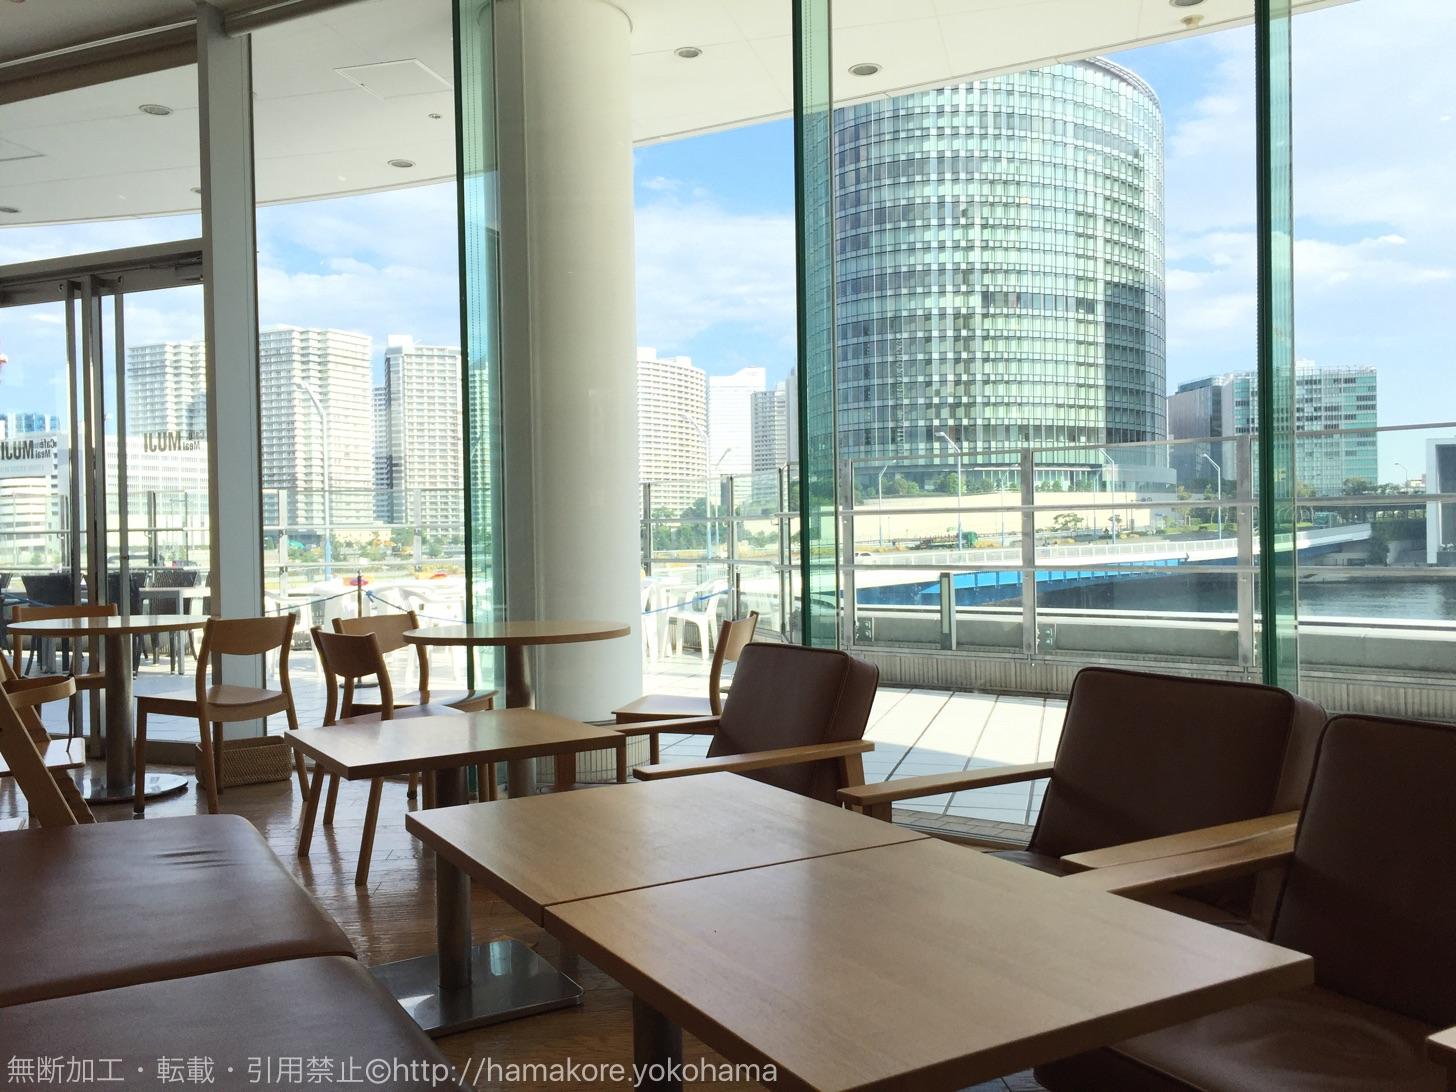 MUJIカフェ 横浜ベイクォーター店はみなとみらい一望の絶景!読書や打ち合わせにおすすめ